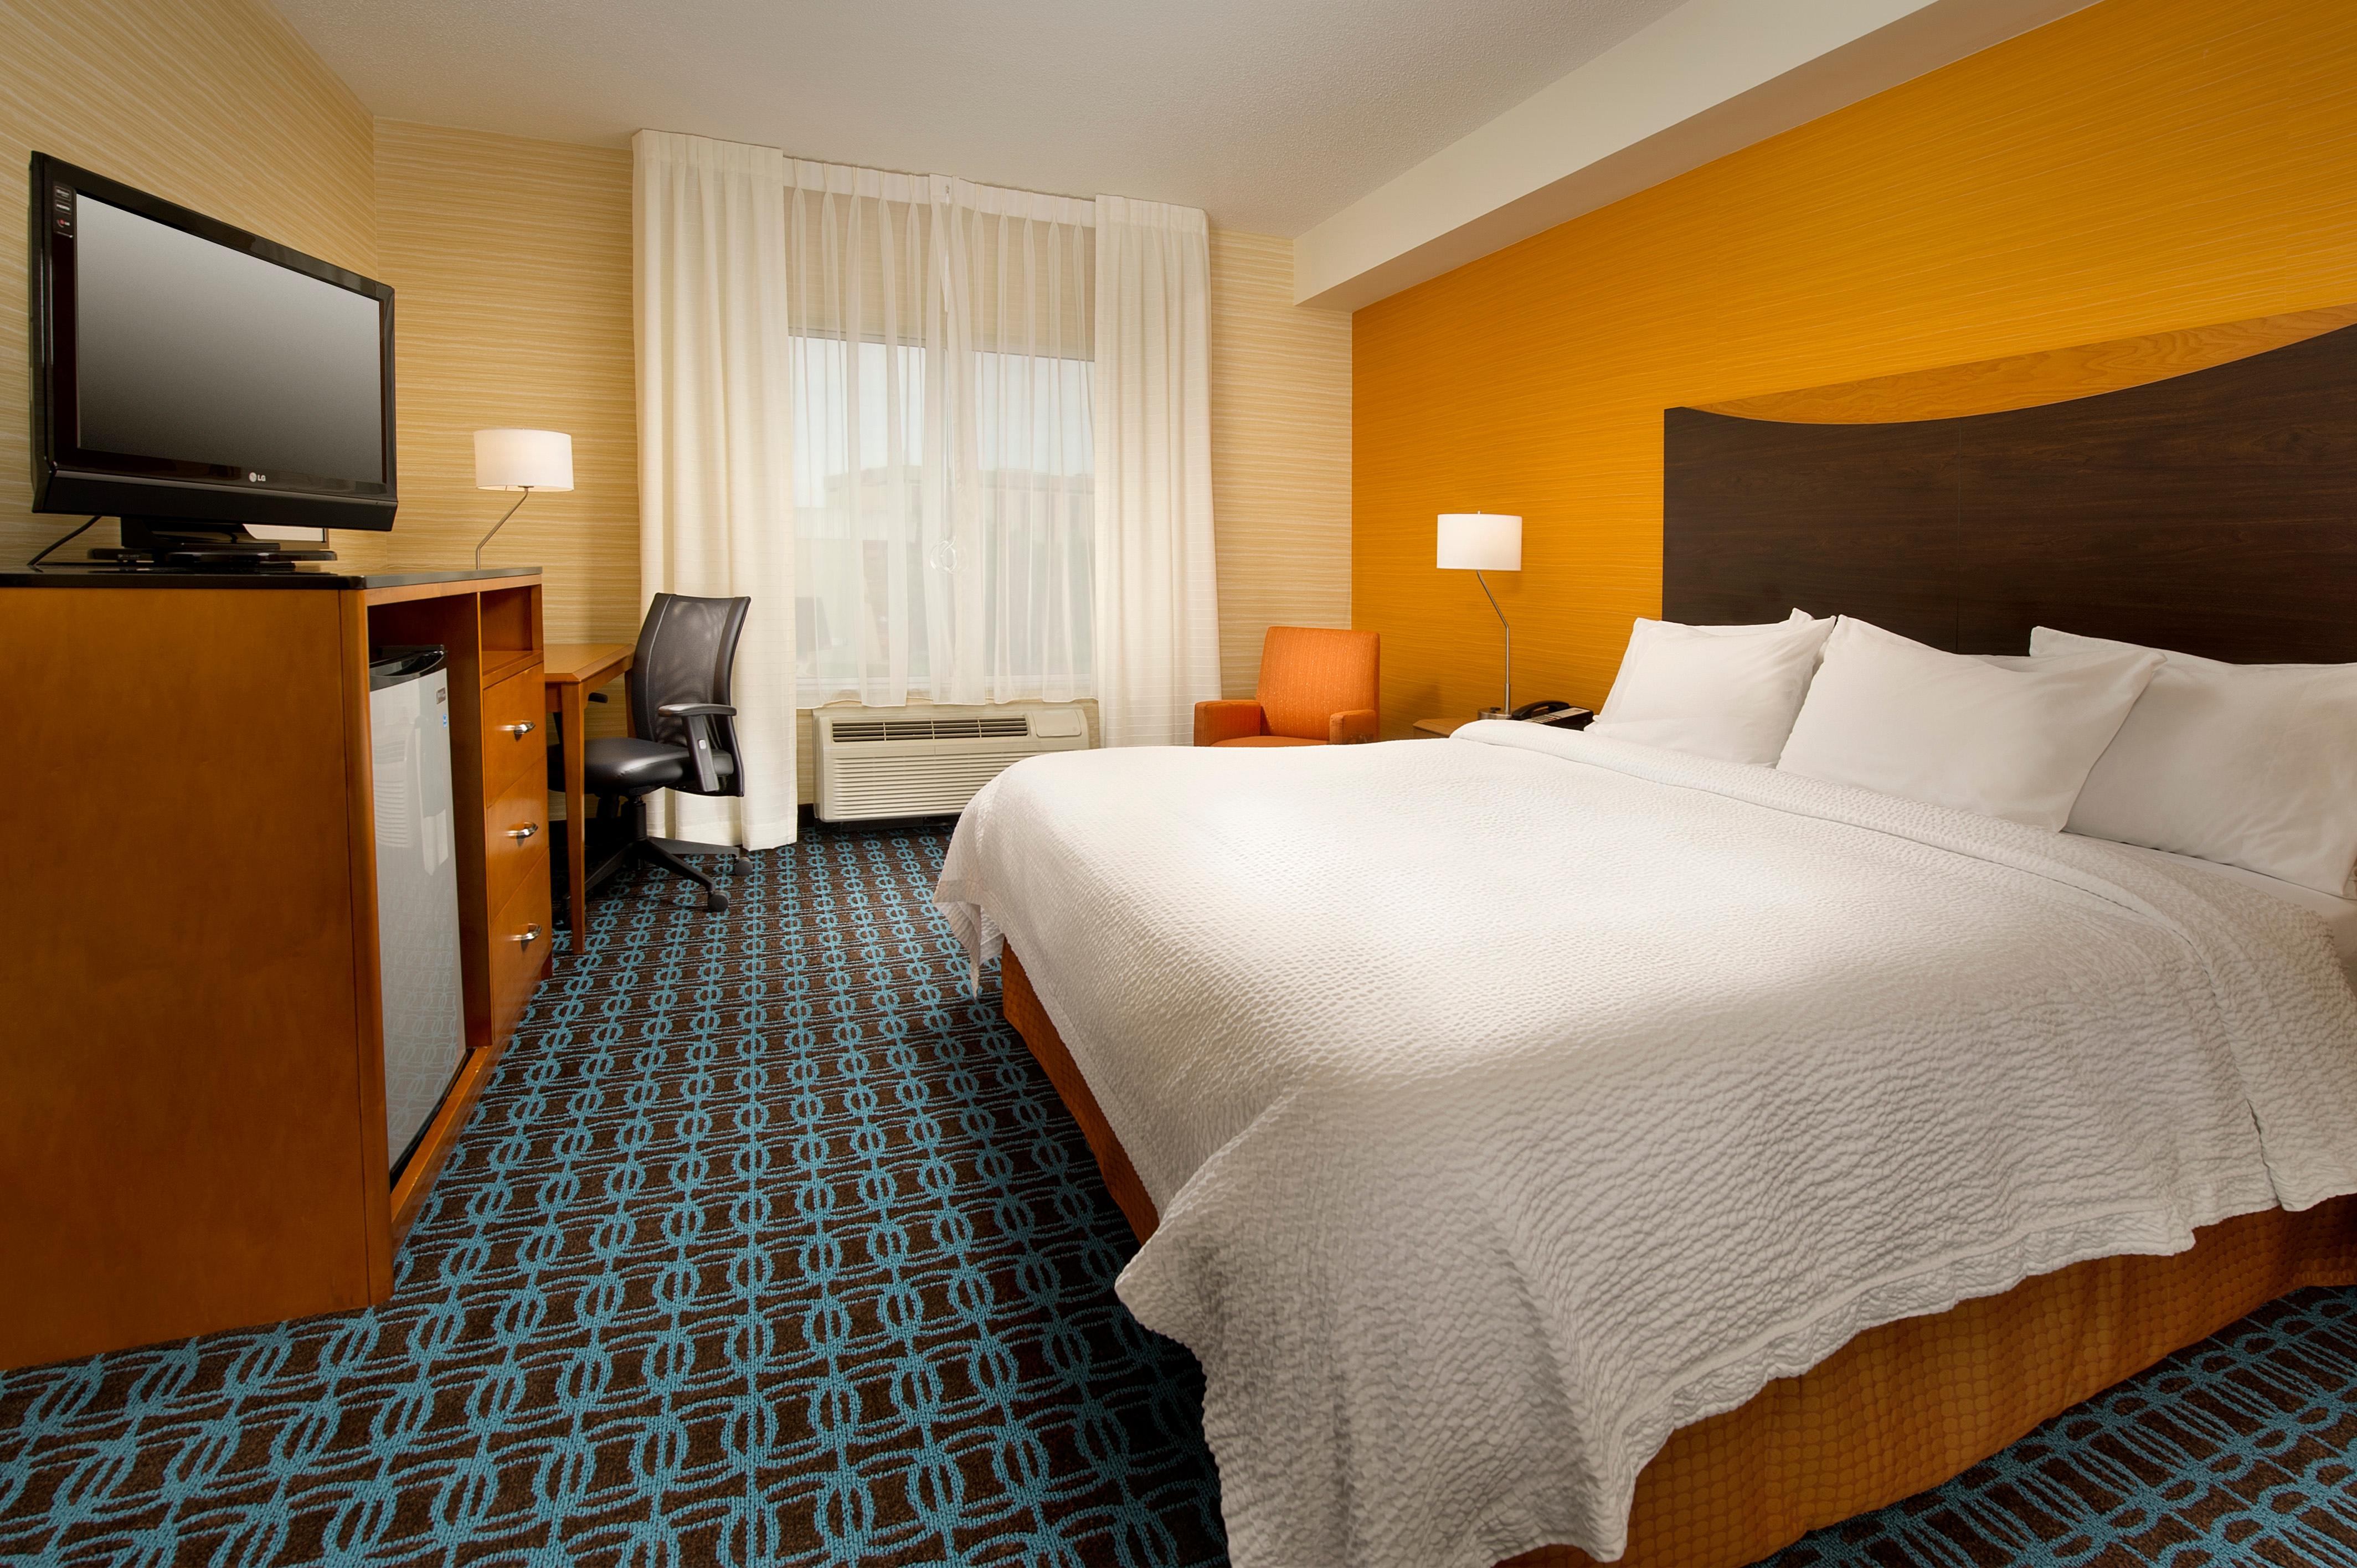 Fairfield Inn & Suites by Marriott Germantown Gaithersburg image 11